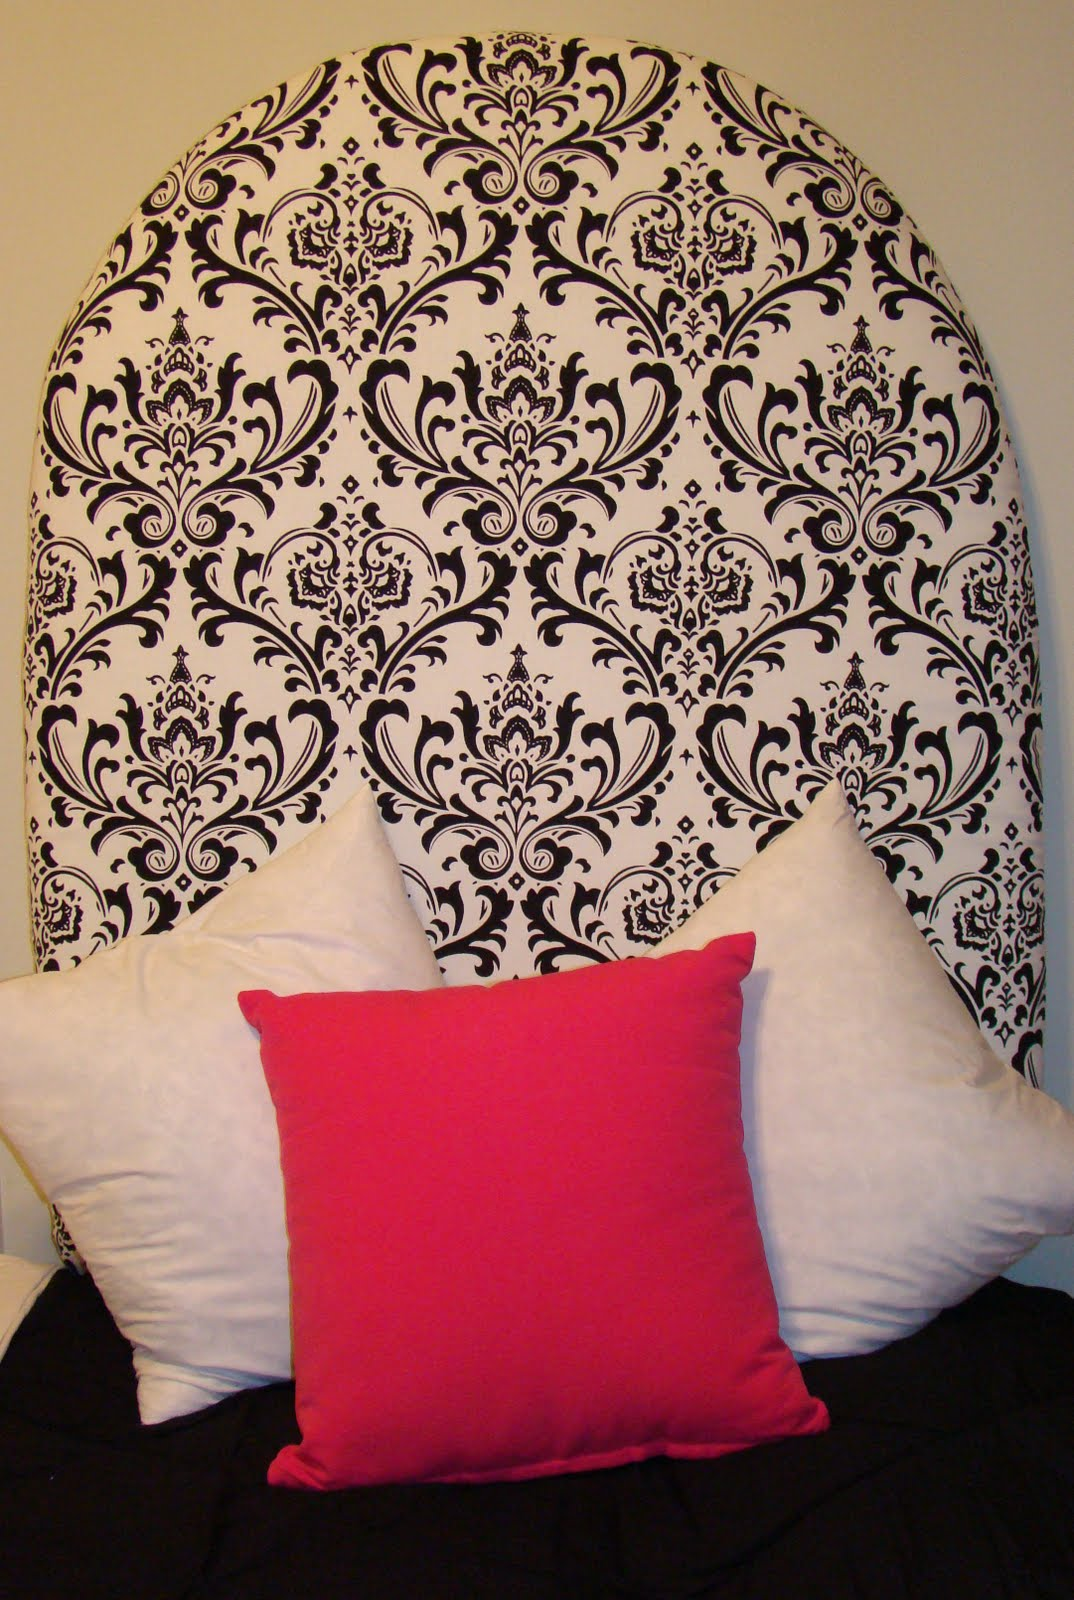 Dorm Room Headboards: Doodlebug Designs, Mg: Dorm Room Upholstered Headboard